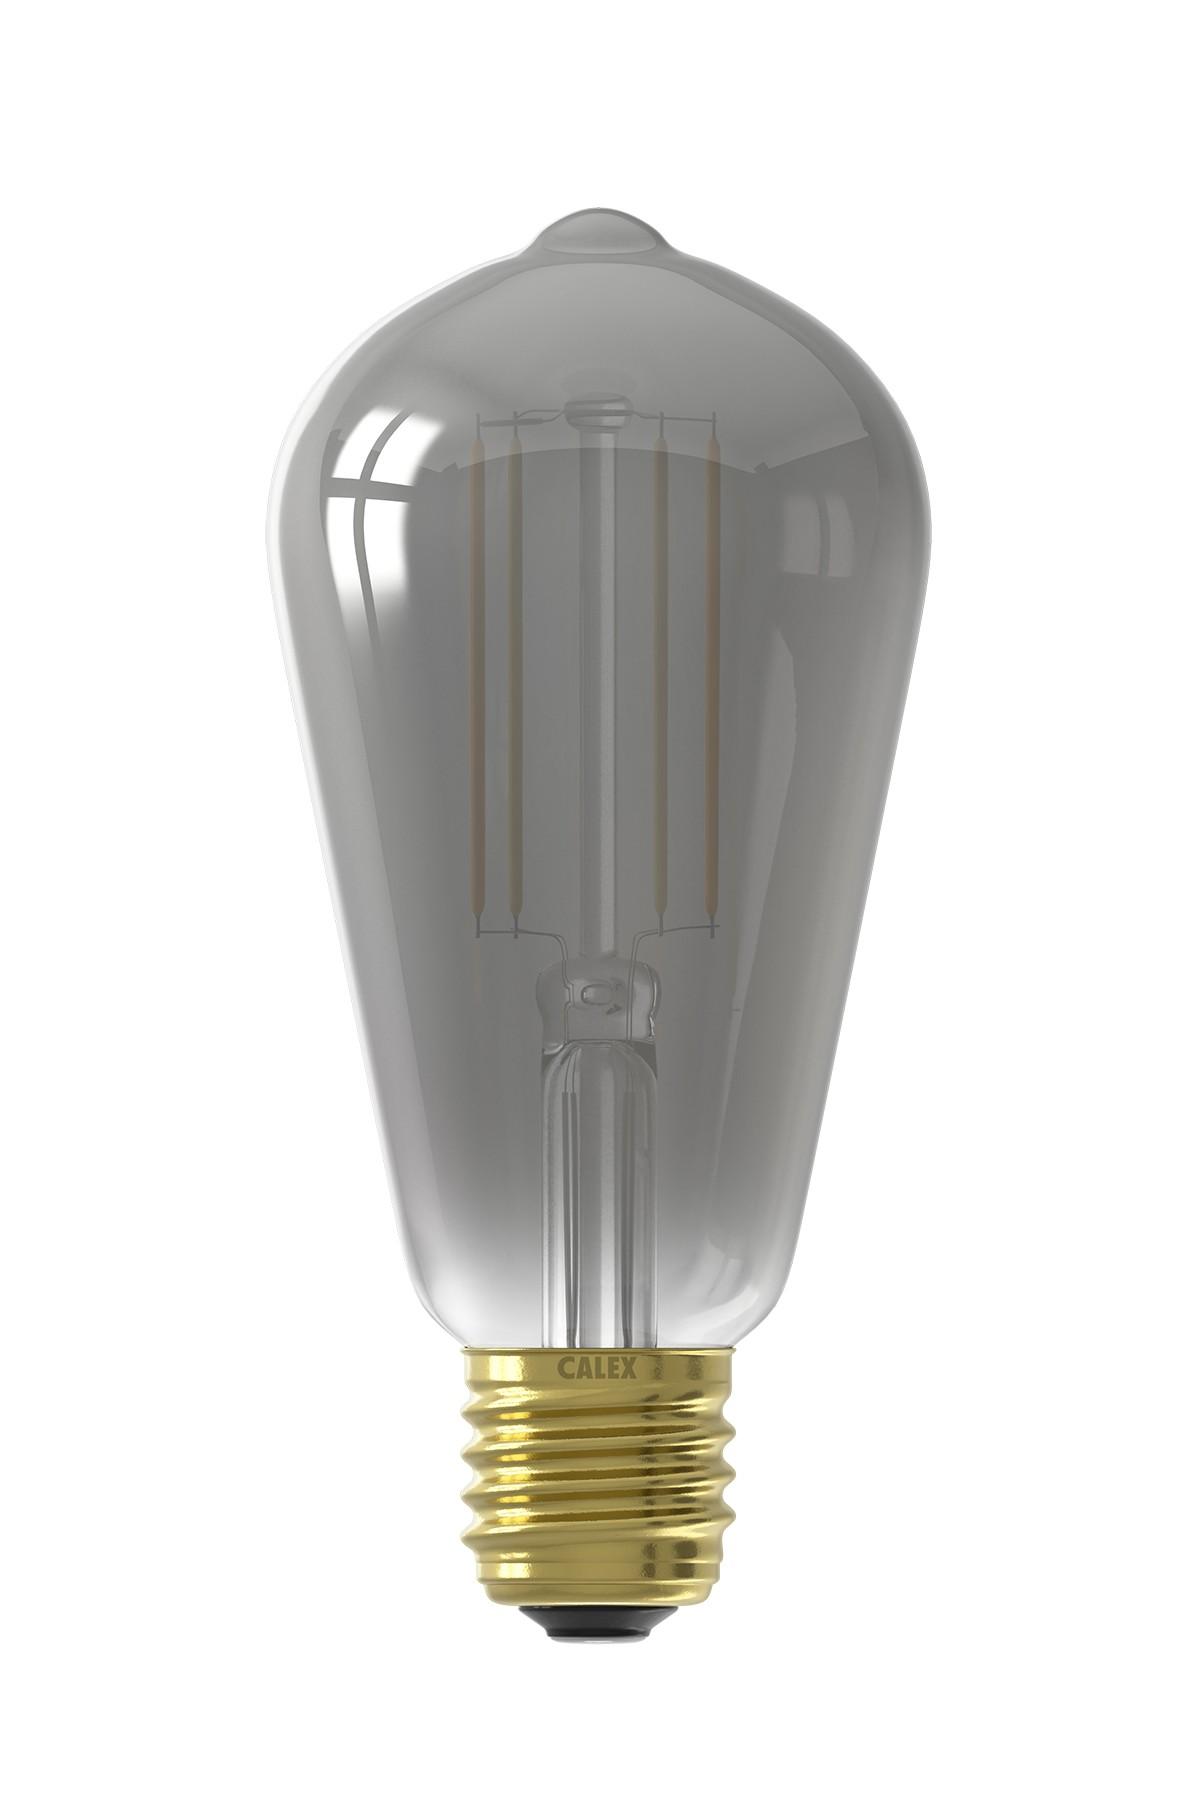 Calex Smart Rustiek led lamp 7W 400lm 1800-3000K